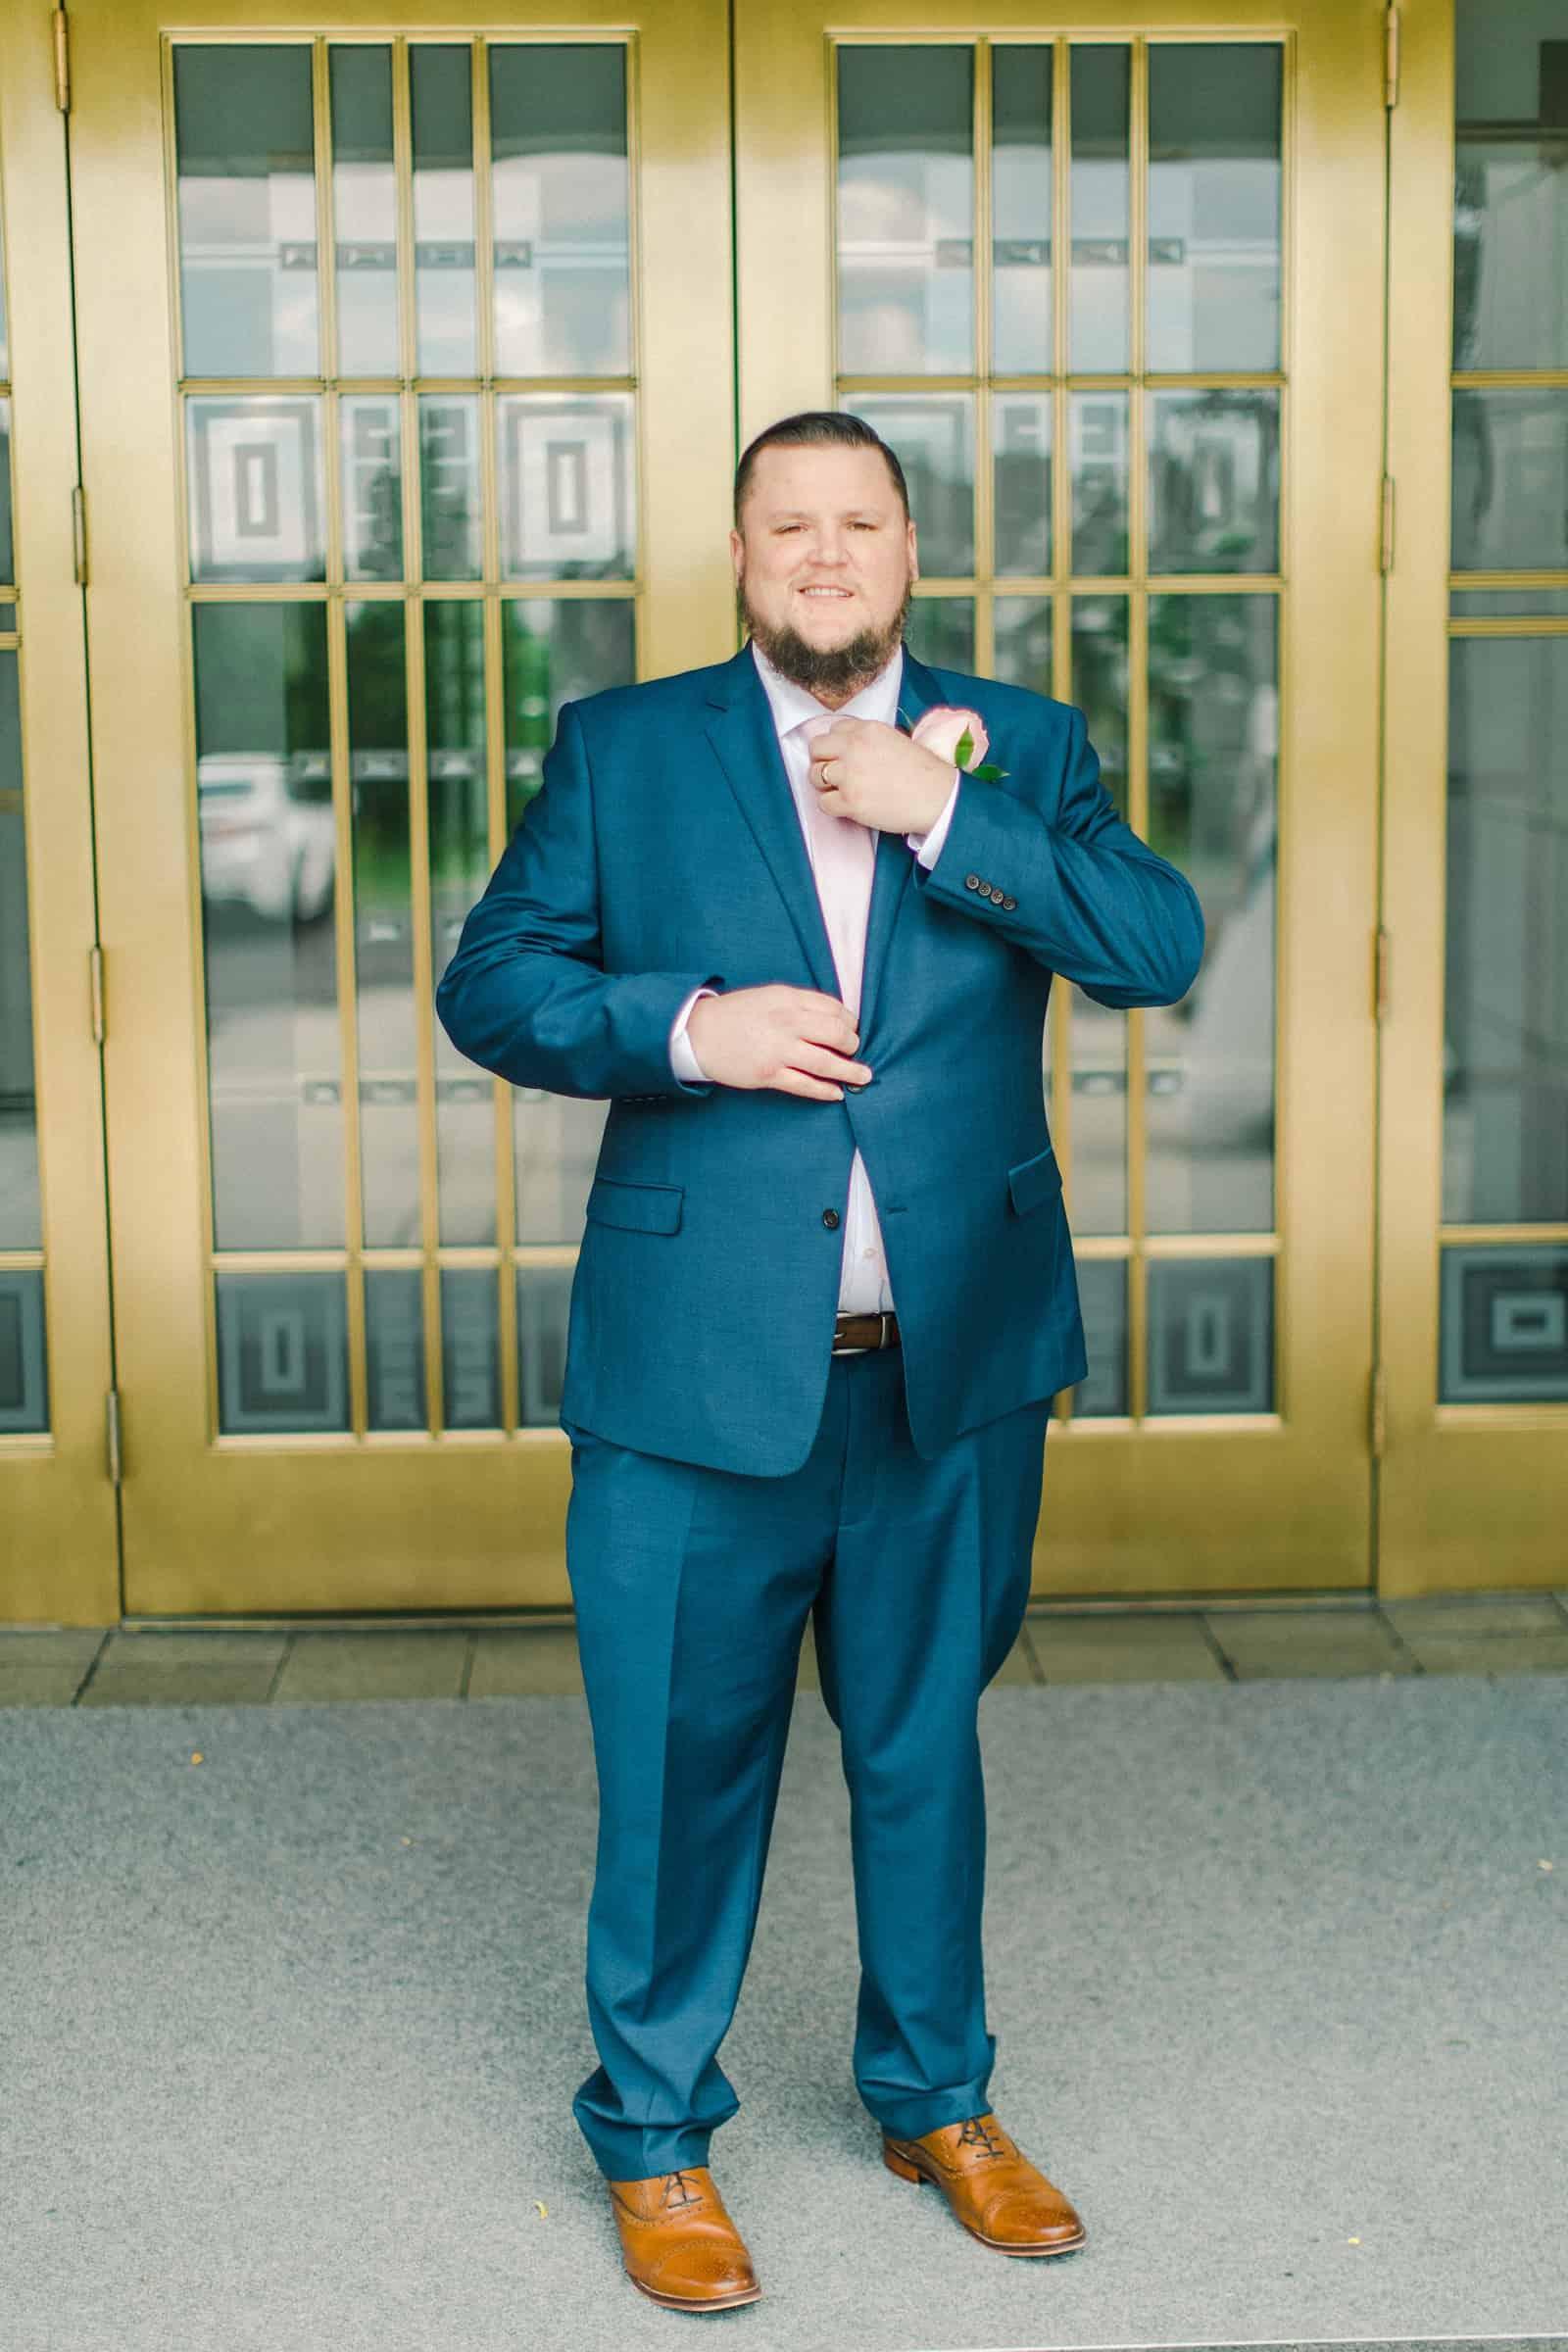 Draper LDS Temple Wedding, Utah wedding photography, summer backyard wedding, groom in navy blue suit and pink tie